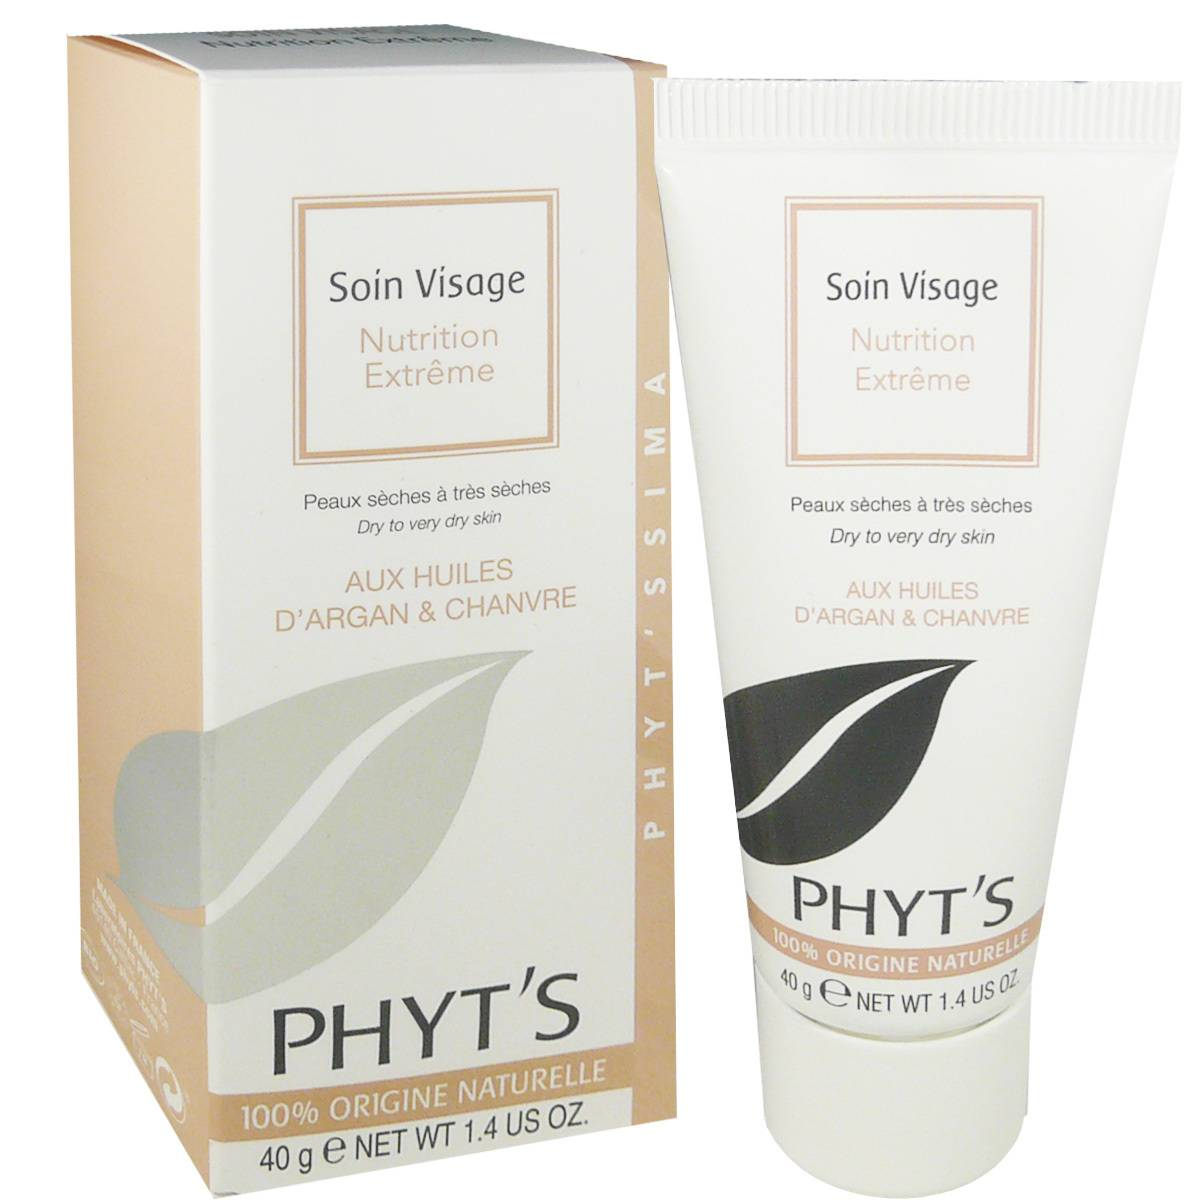 Phyt's nutrition extreme huiles d'argan & chanvre 40 g